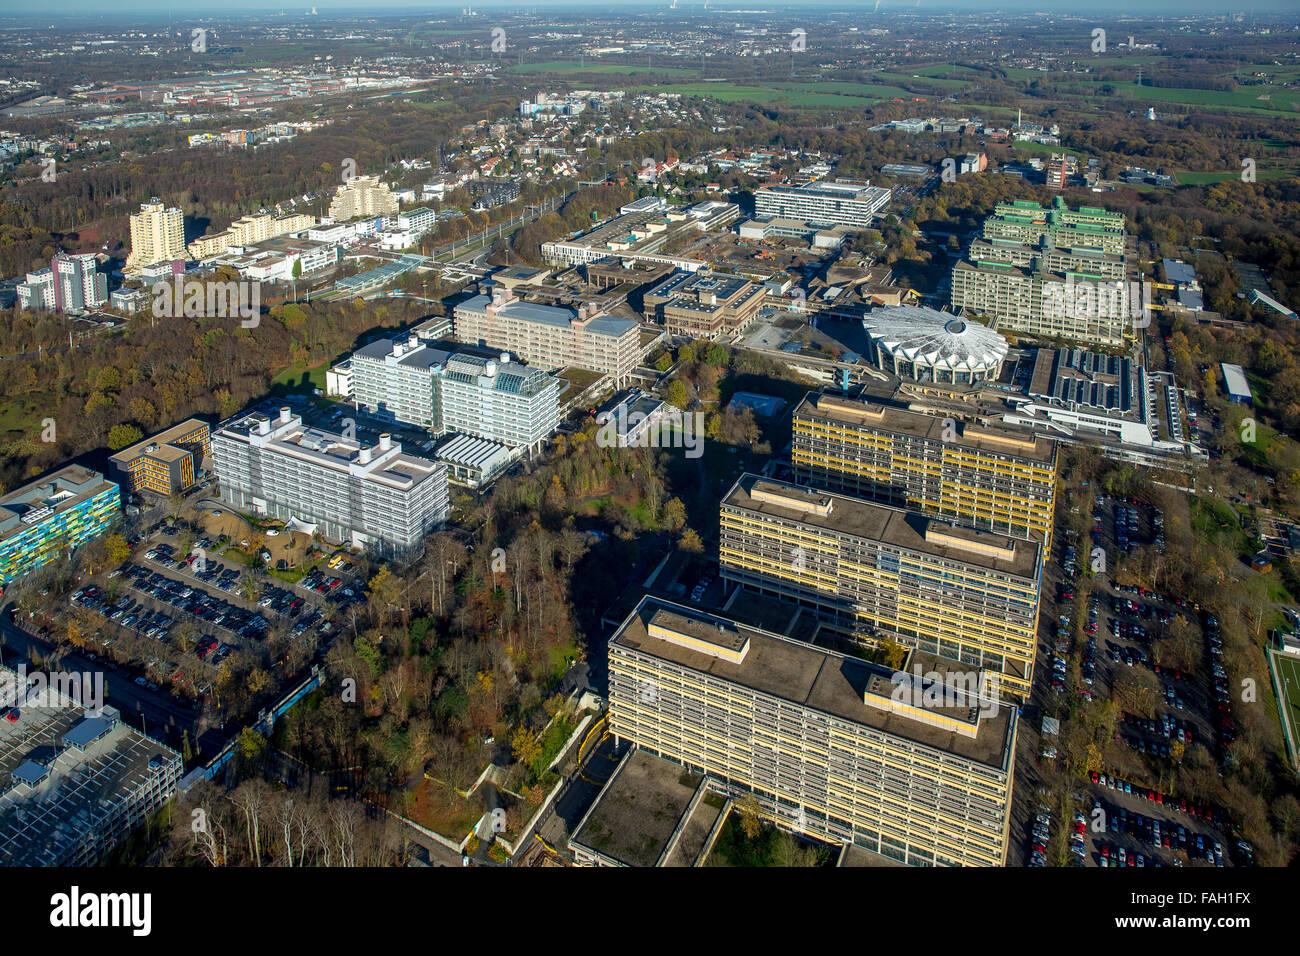 Ruhr University Bochum, Bochum, Ruhr district, North Rhine-Westphalia, Germany - Stock Image